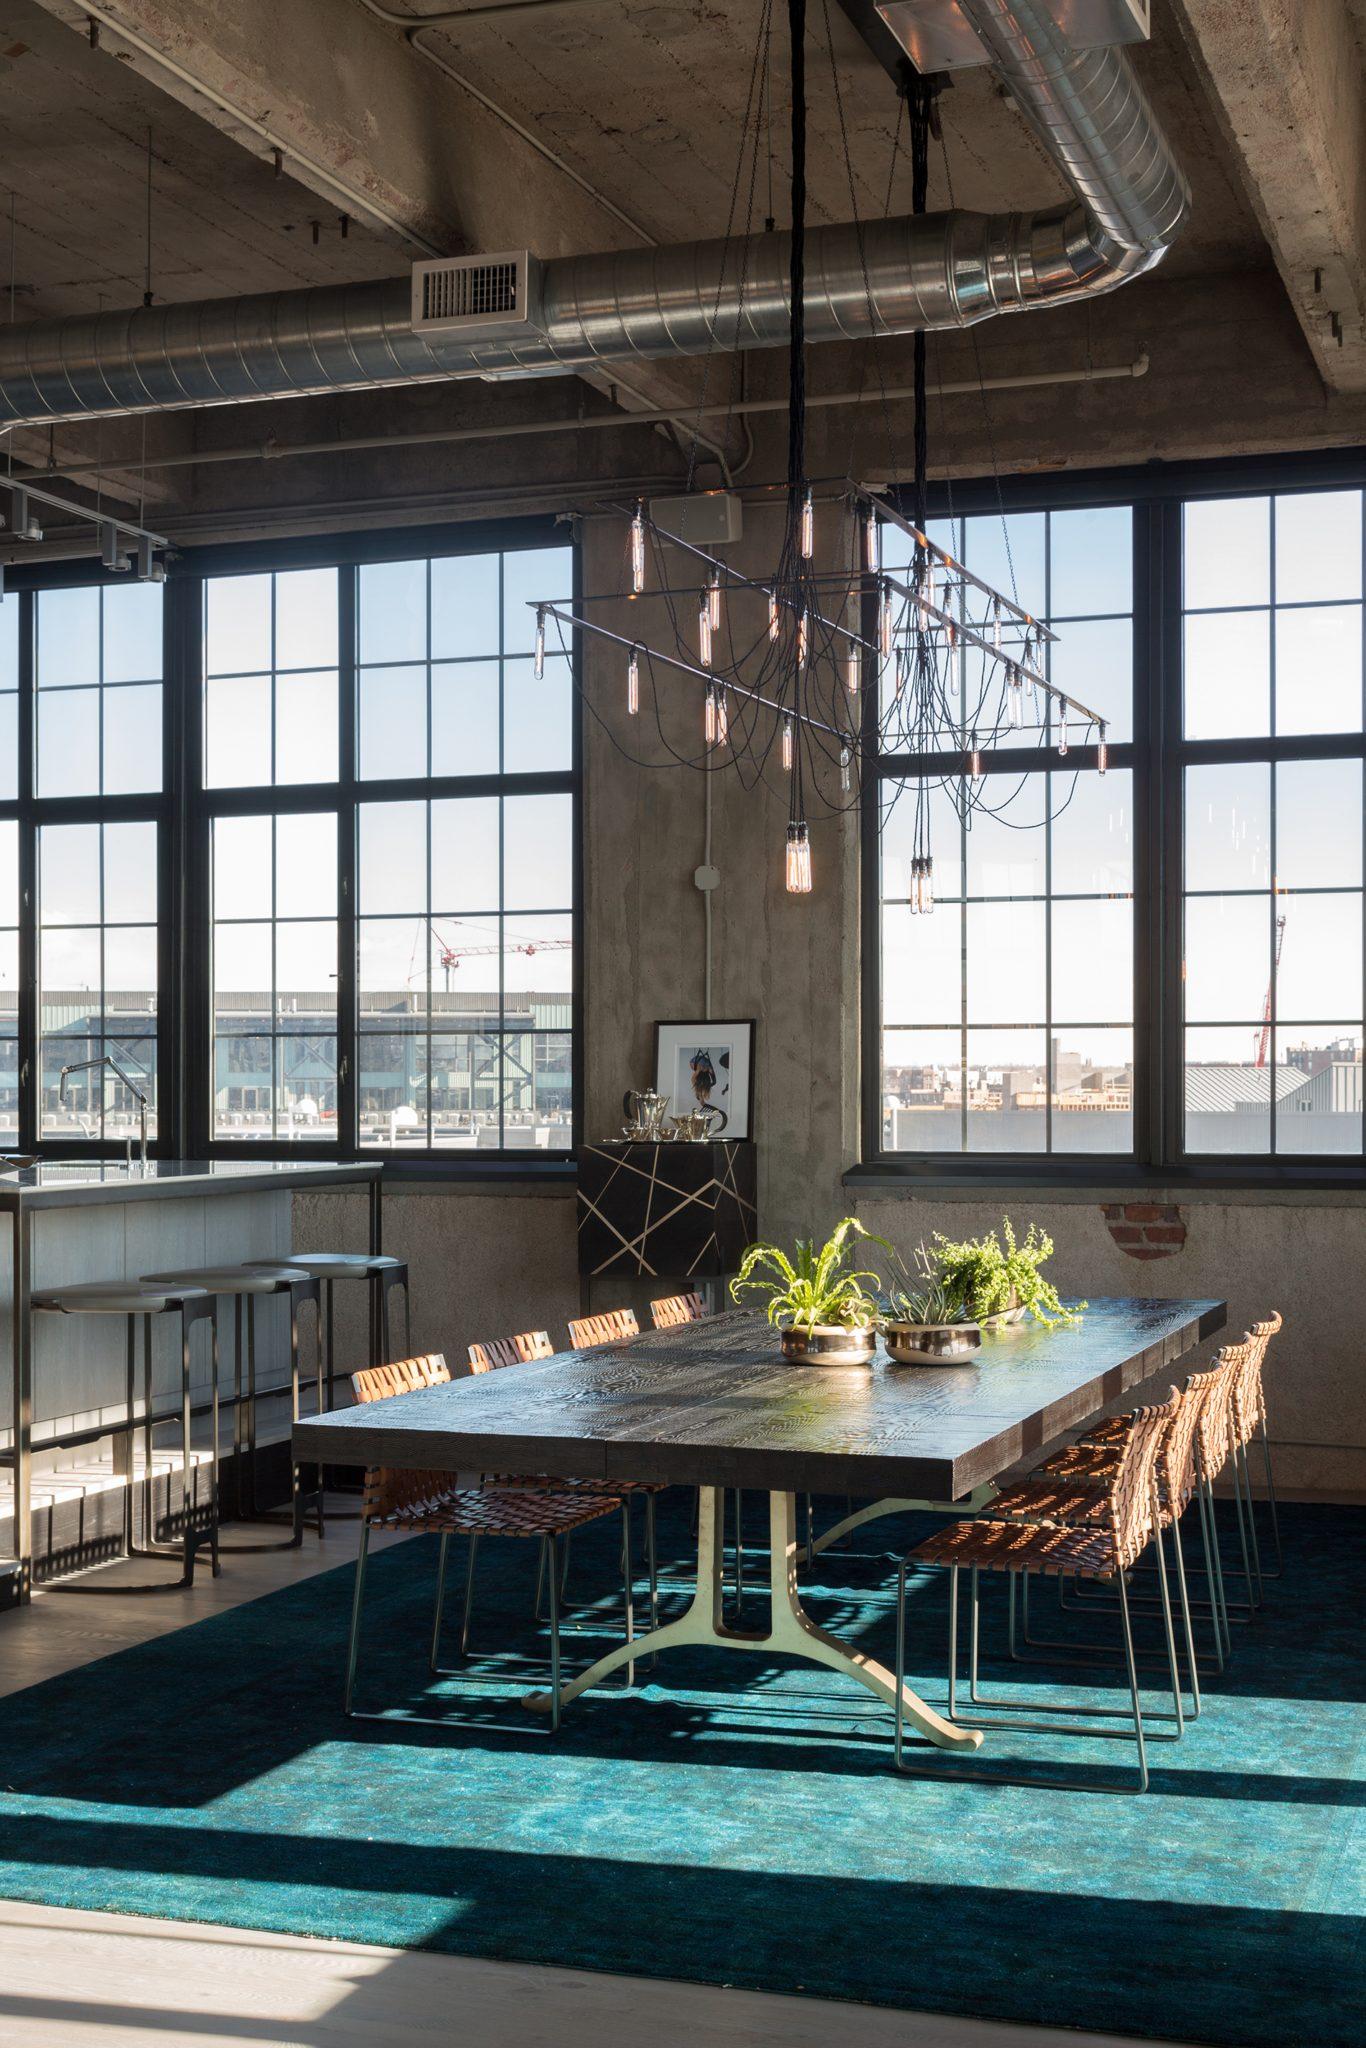 Flour Mill Dining Room by STUDIO GILD